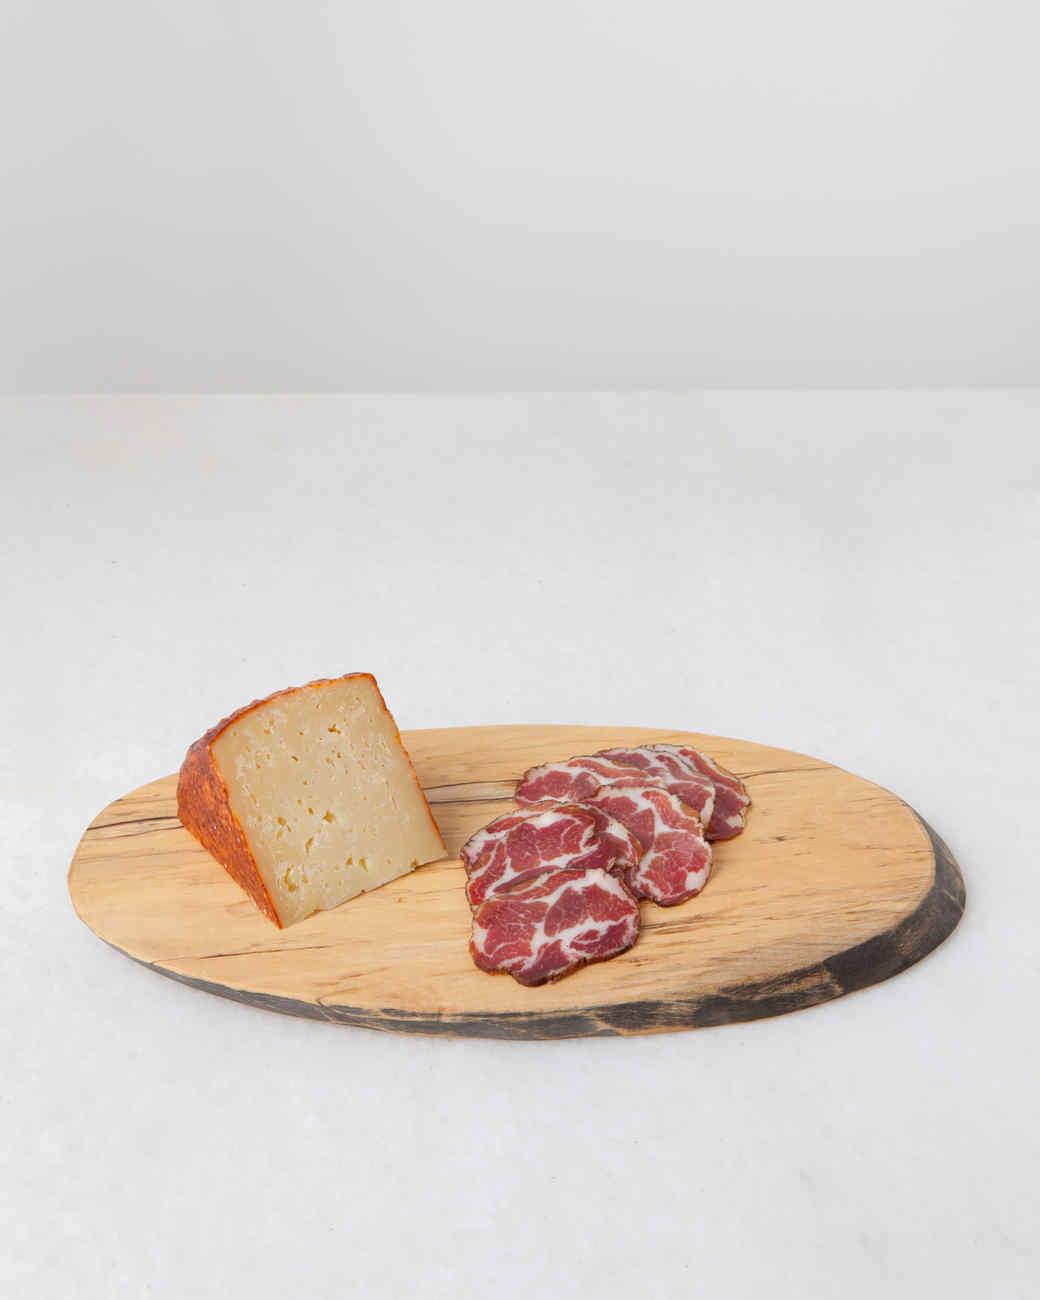 cheese-boards-d110478-0128r.jpg